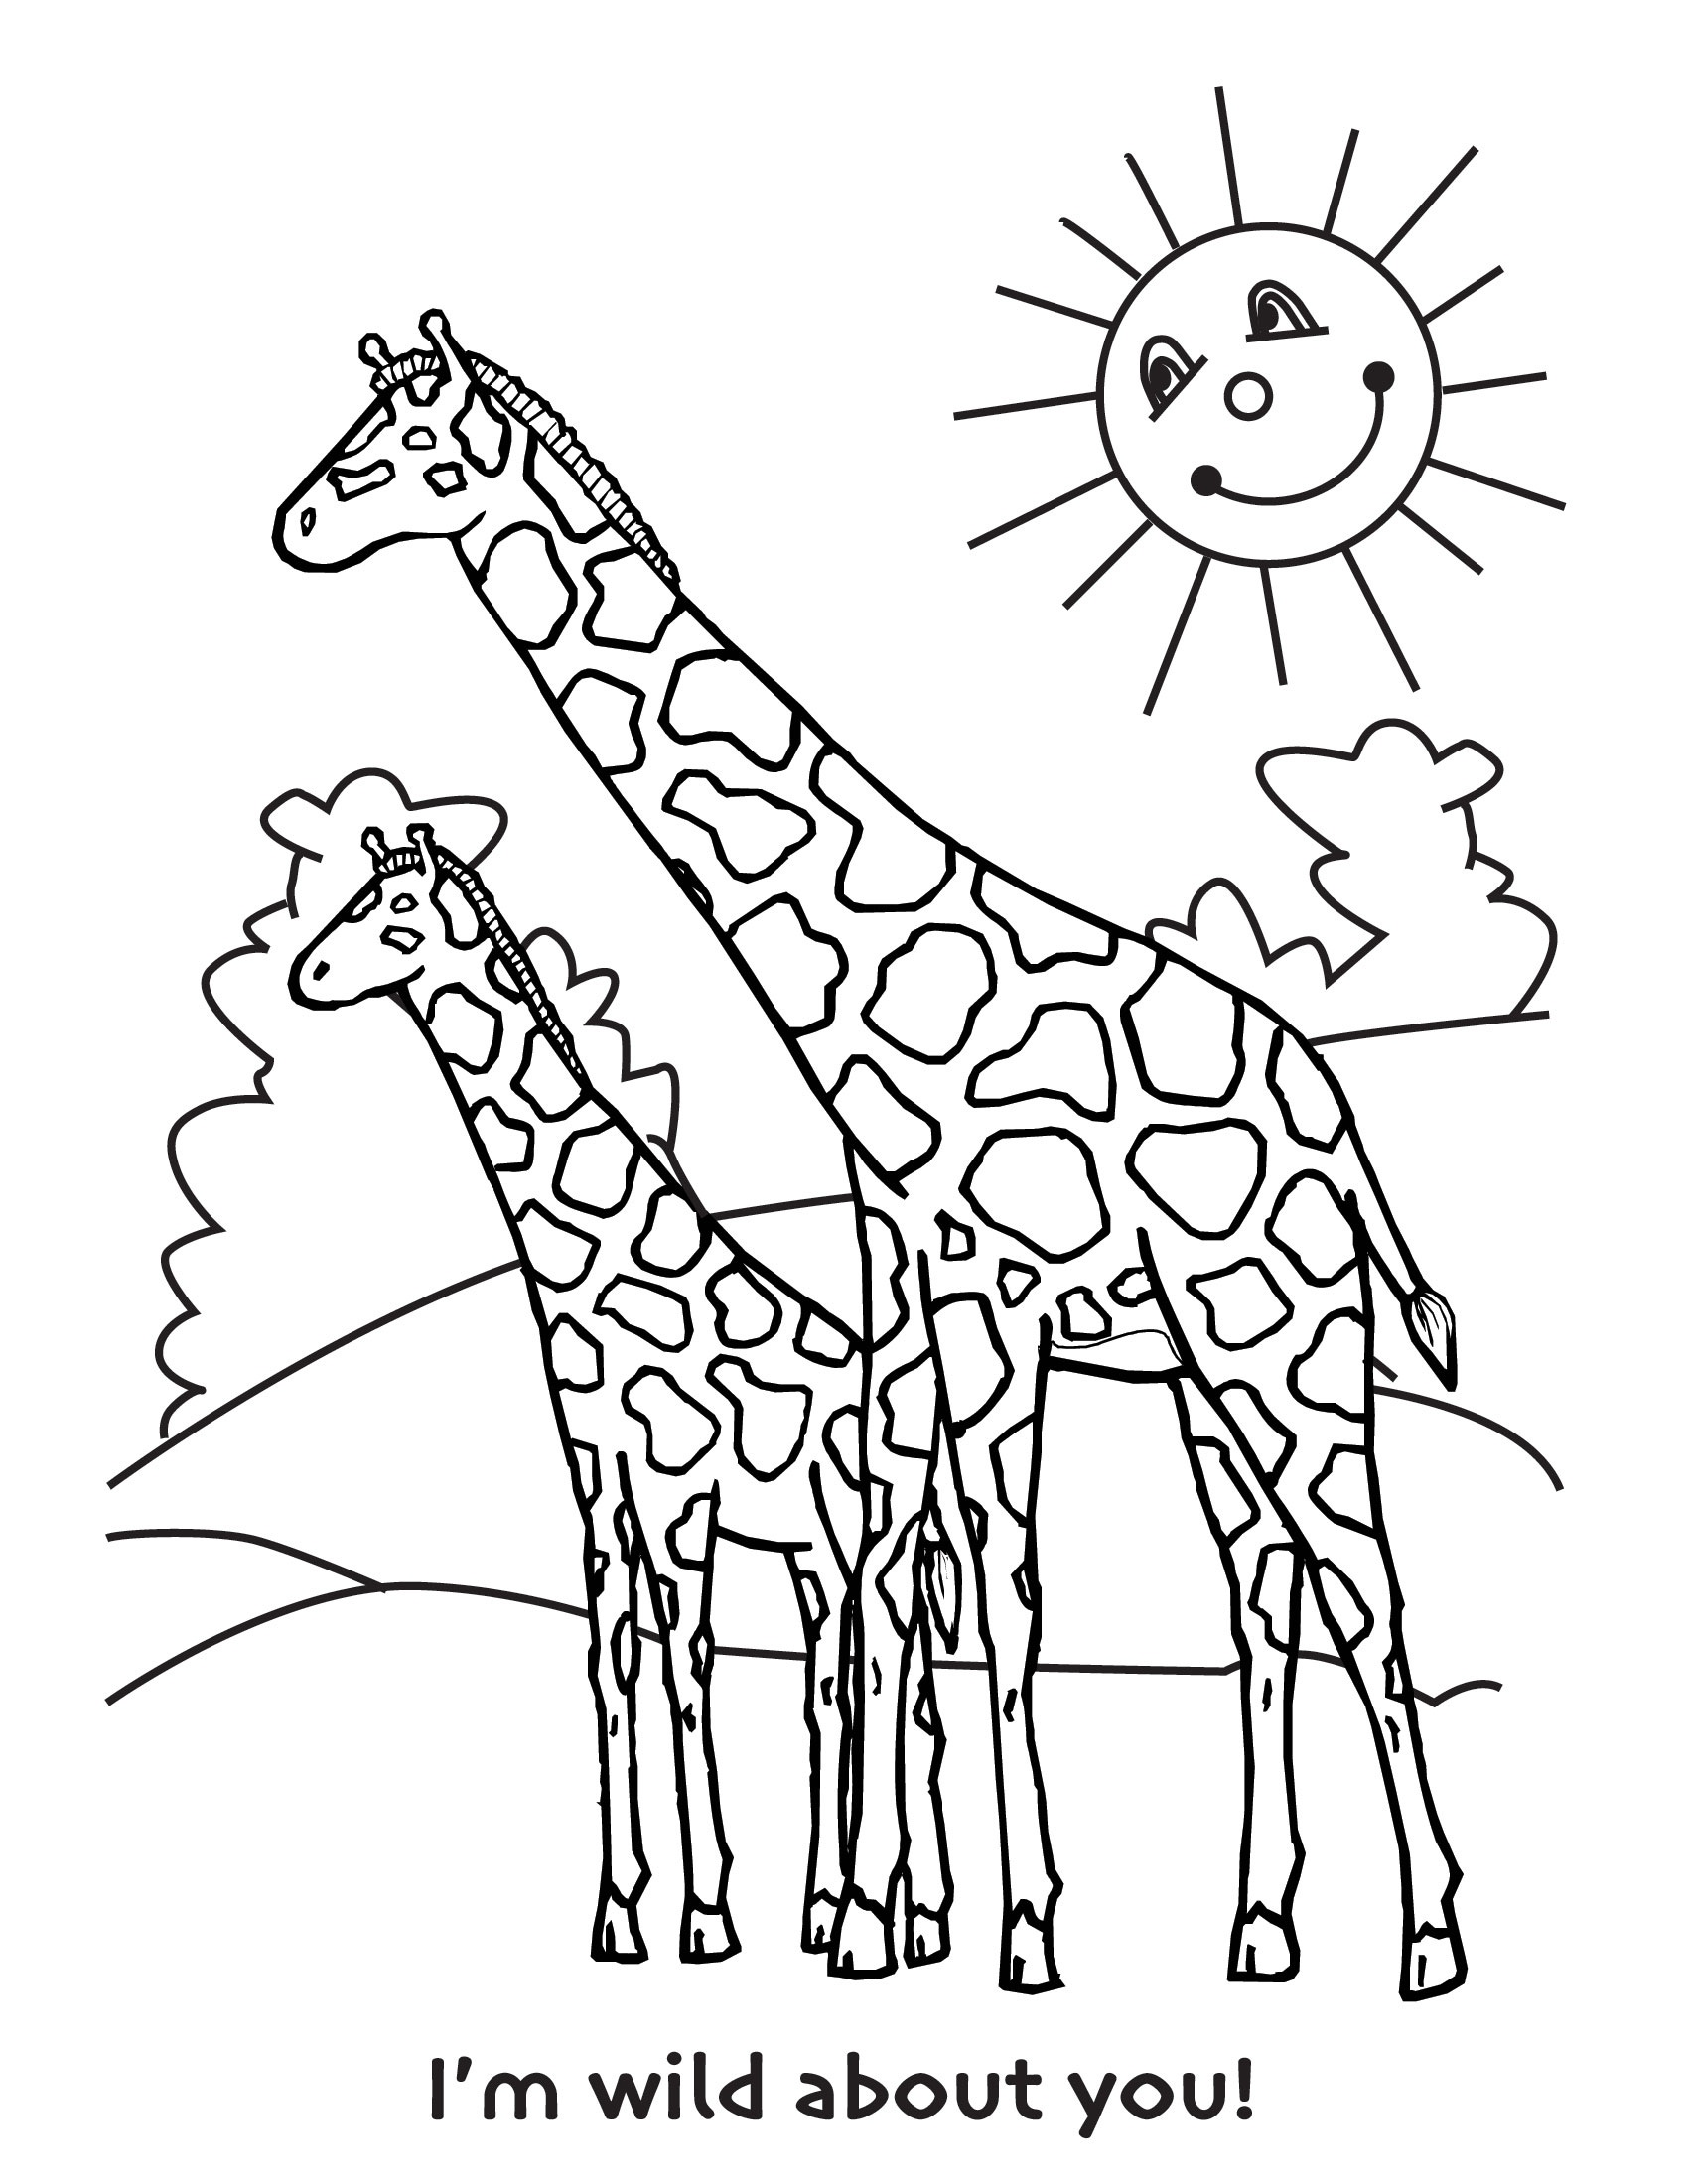 Giraffe Line Drawing at GetDrawings | Free download